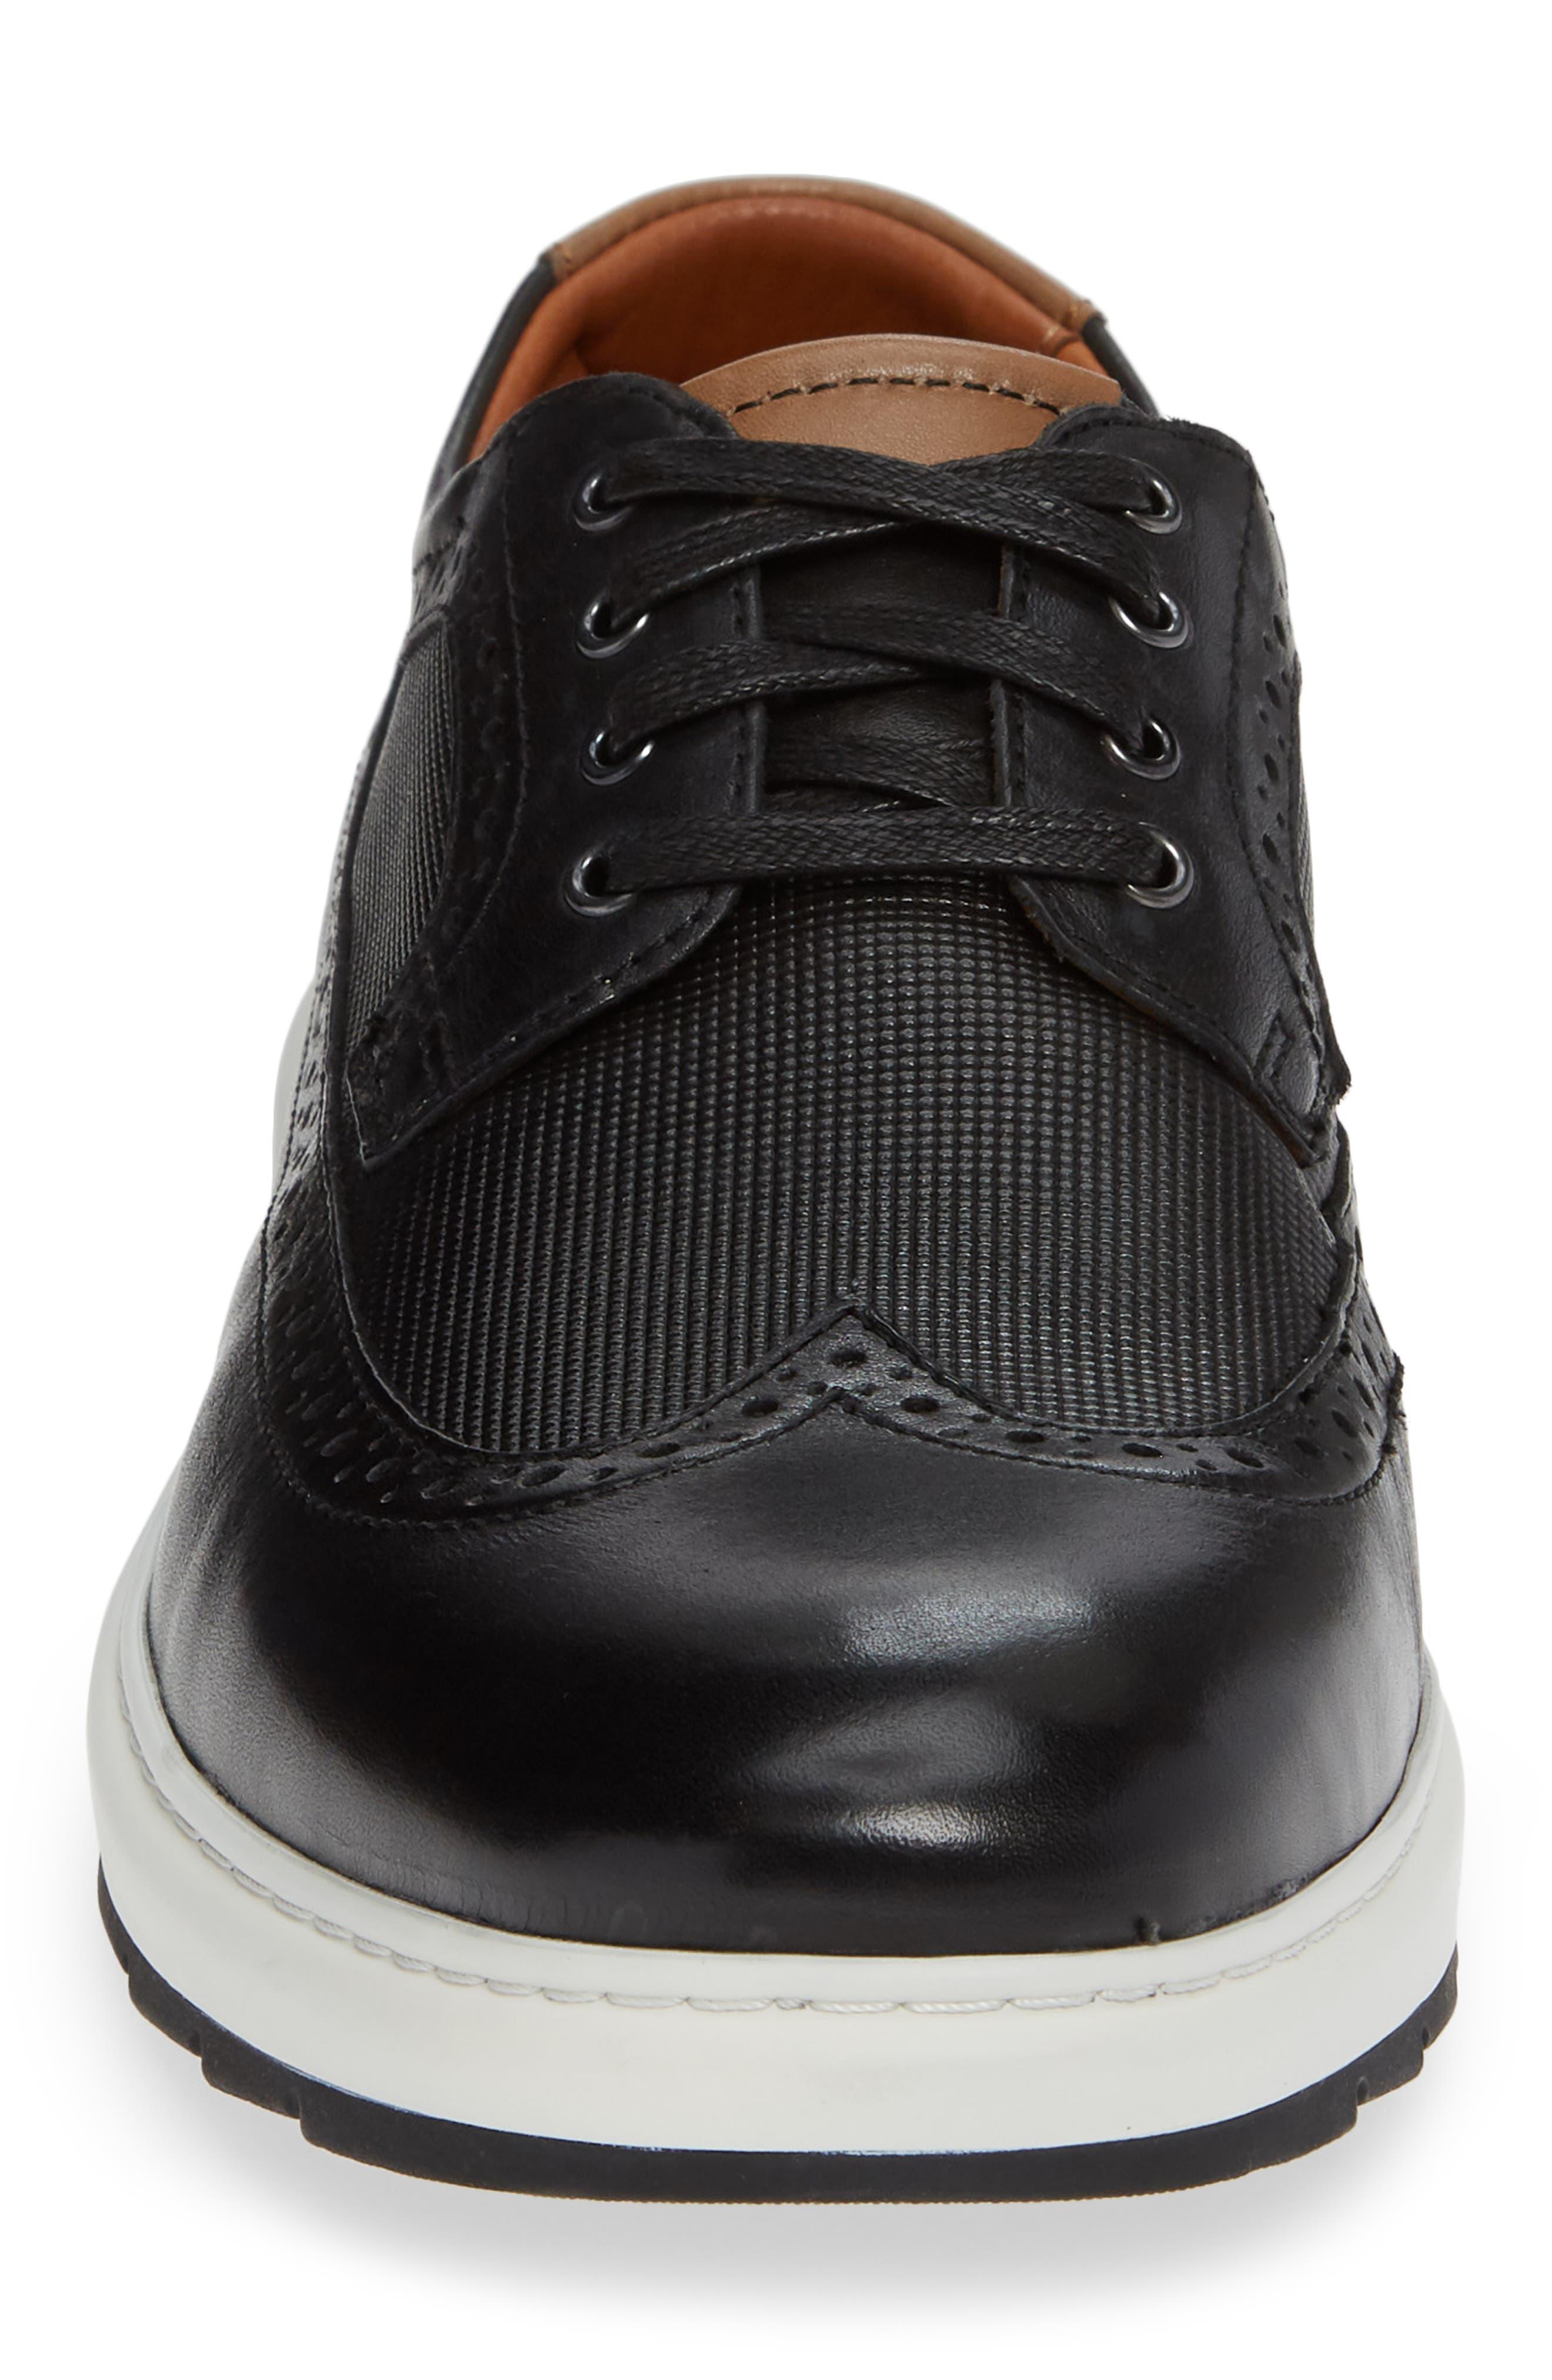 Elliston Wingtip Sneaker,                             Alternate thumbnail 4, color,                             BLACK LEATHER